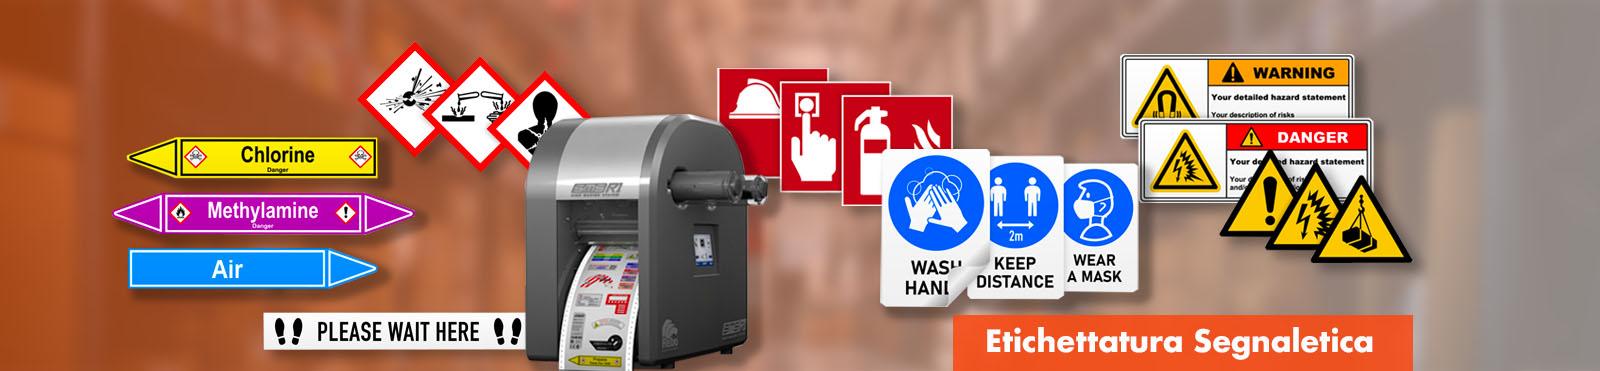 Stampa etichettatura segnaletica e cartelli segnalatori